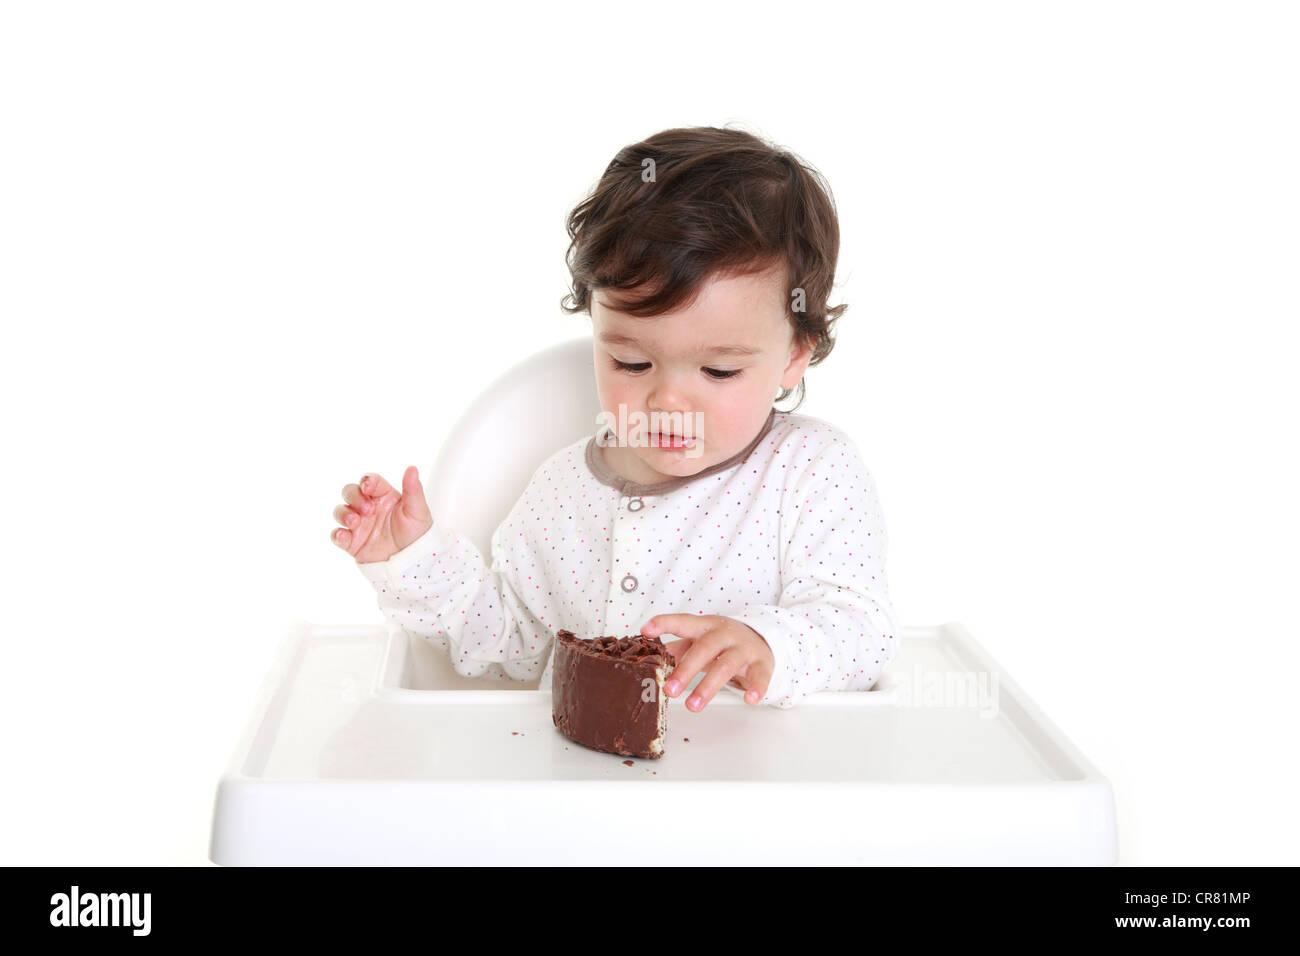 Baby eating chocolate cake - Stock Image